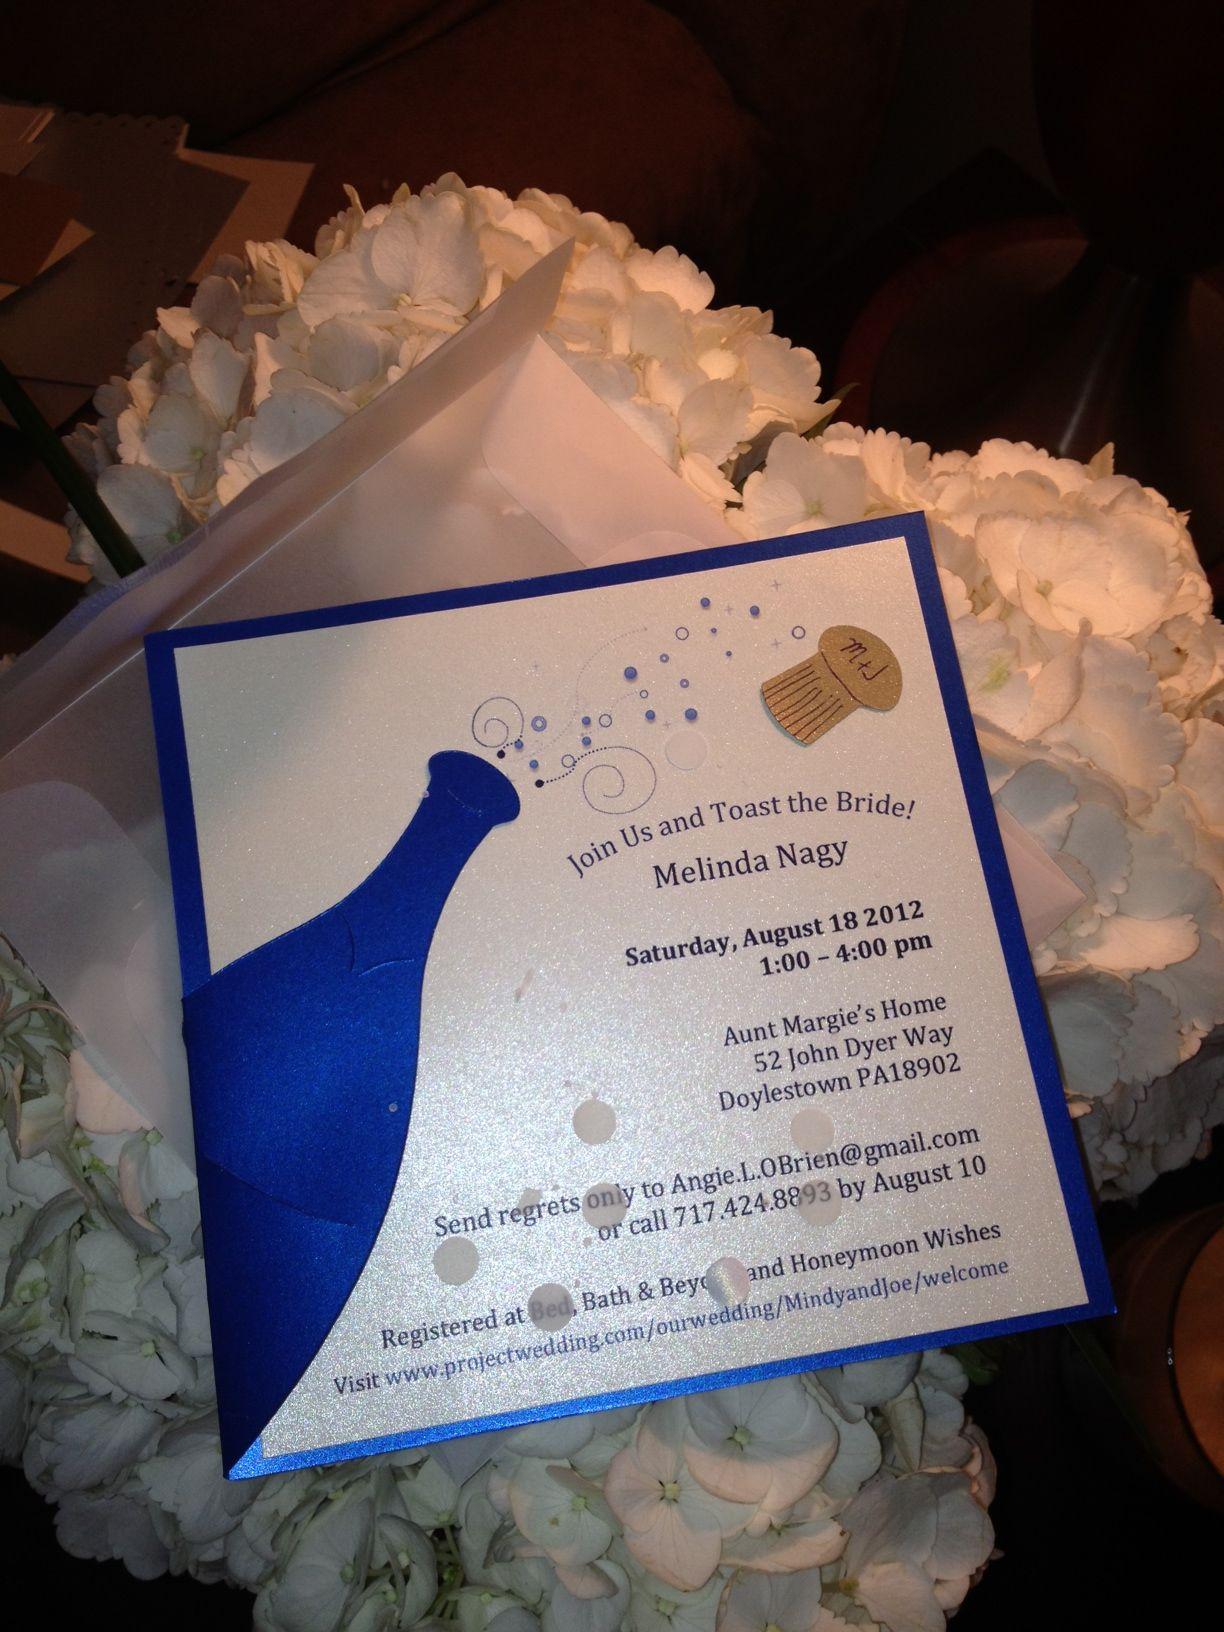 bridal shower invitations registry etiquette%0A Bridal Shower Invitation  Handmade by Angie O u    Brien  The Cork and bubbles  are